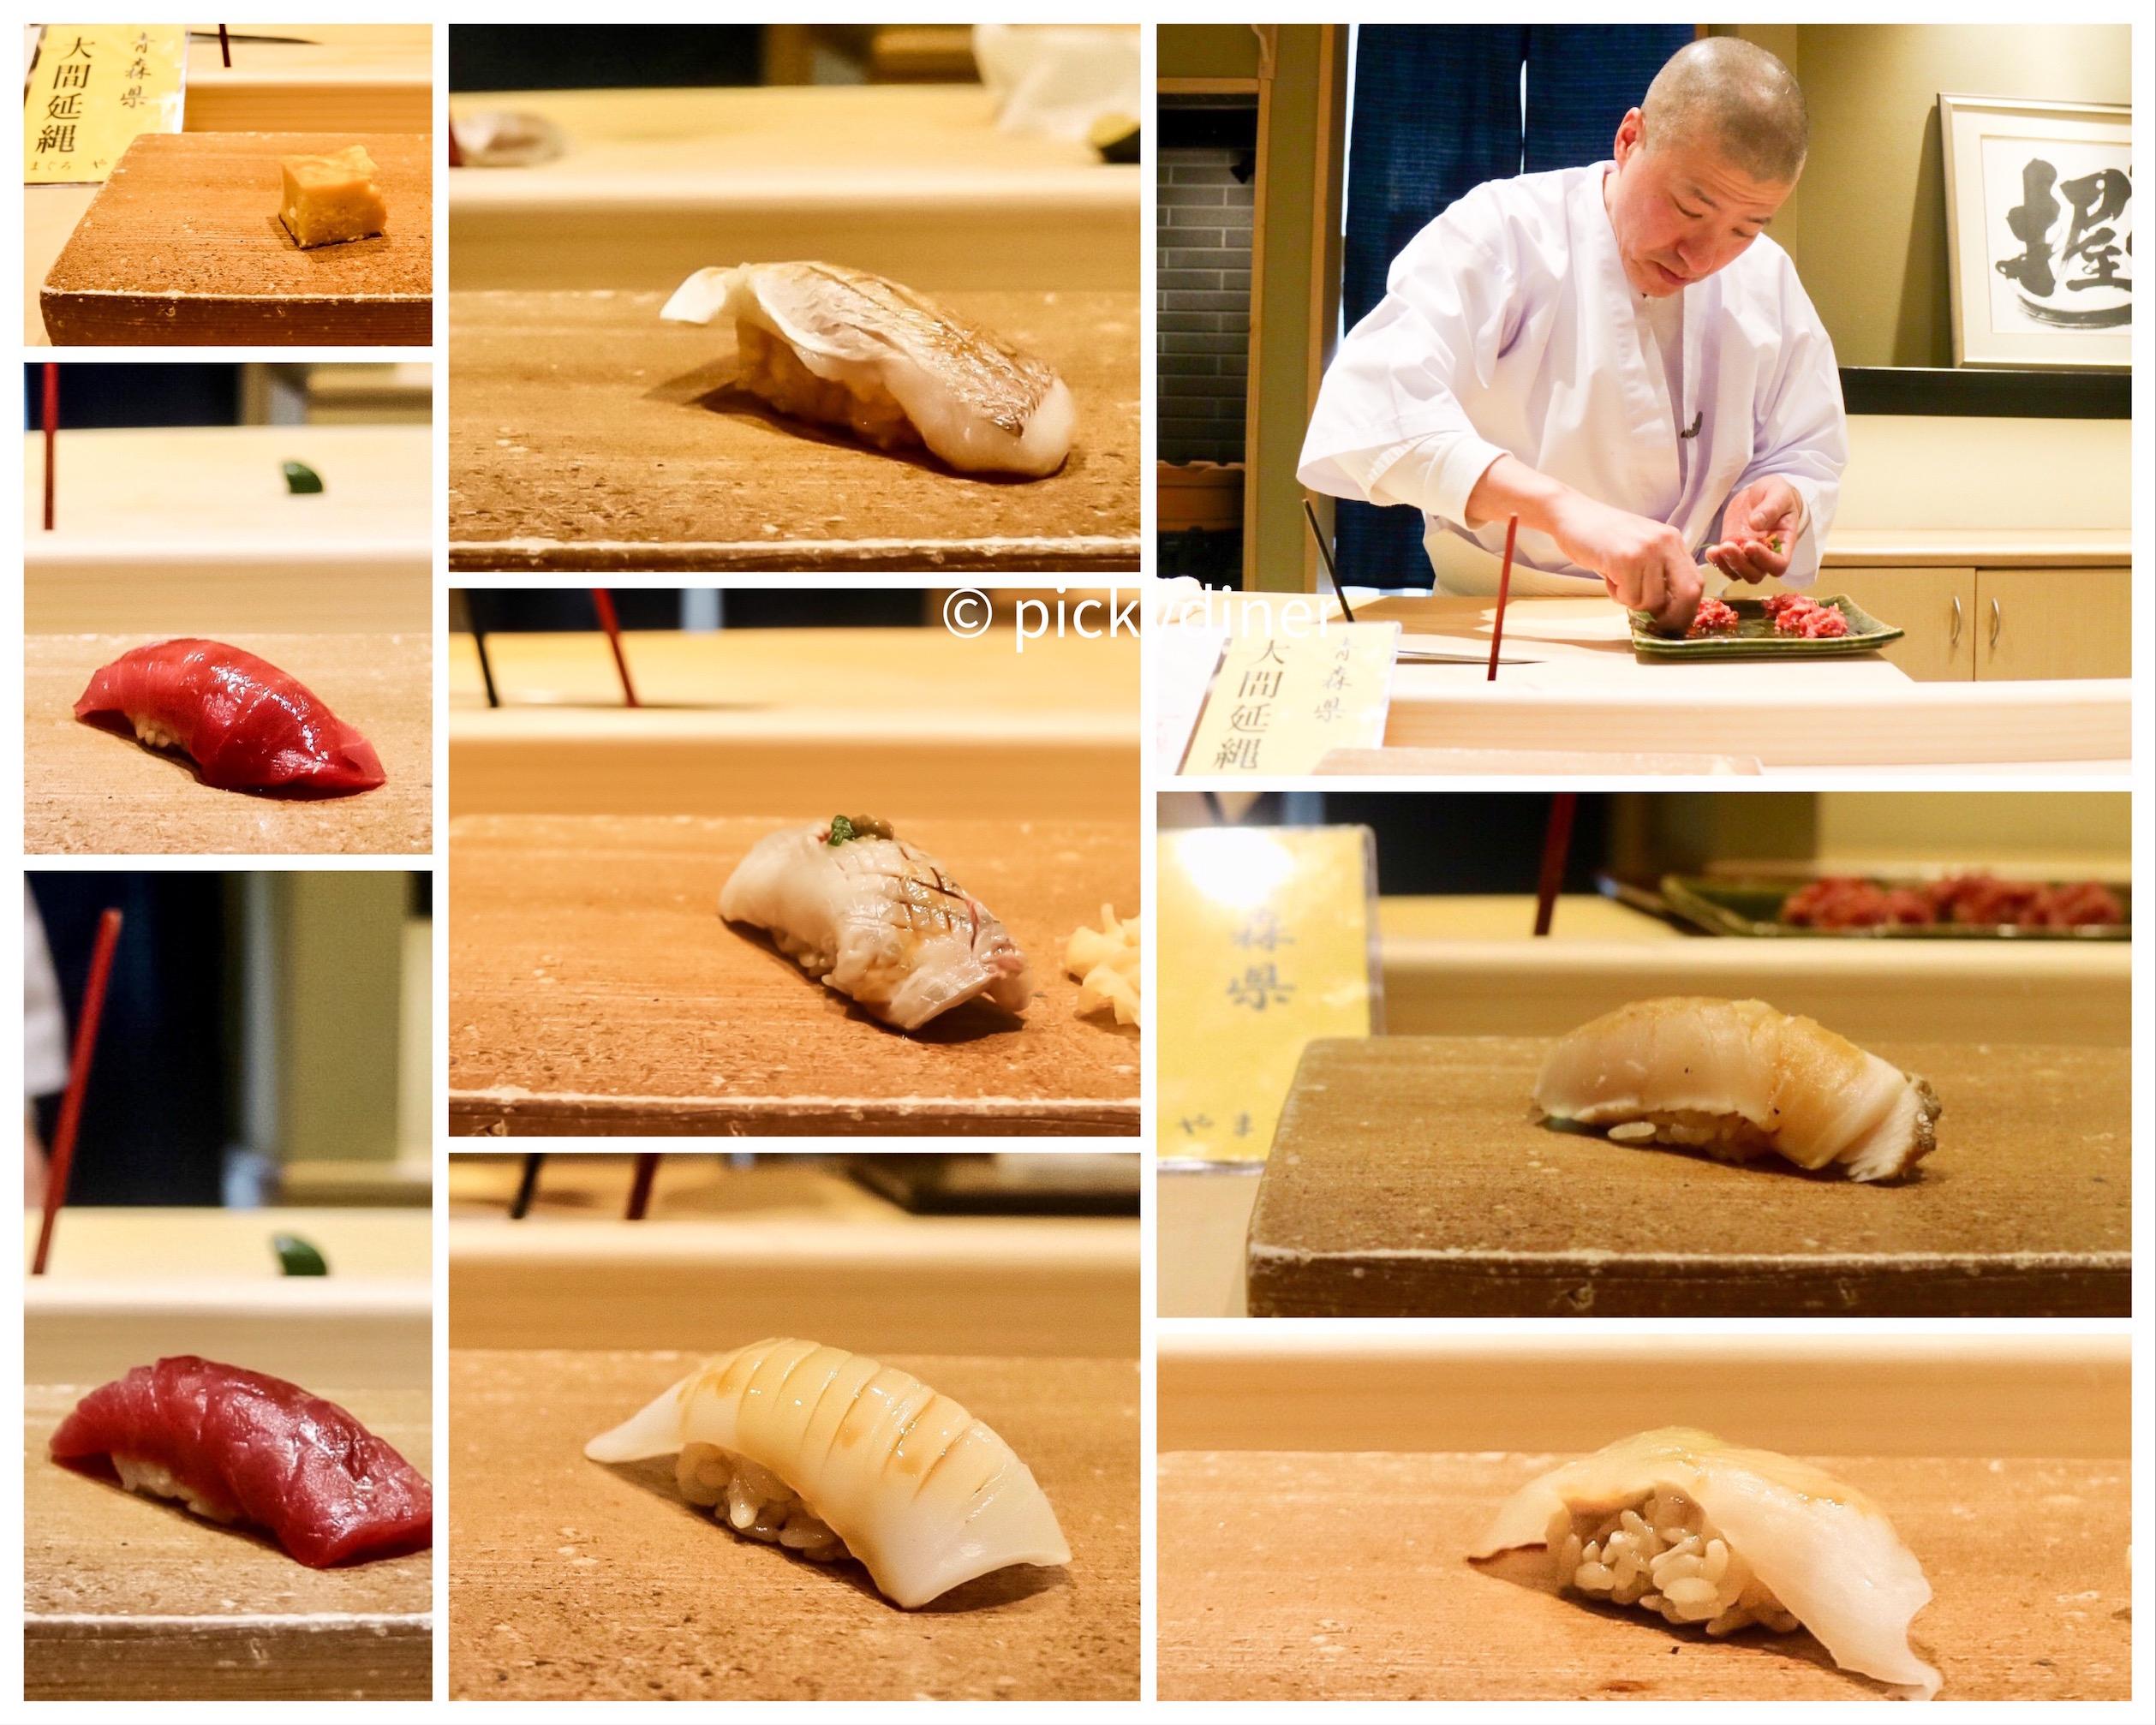 From top left, clockwise: tamagoyaki, kasuo, chef Hayashi, sawaru, kawahgi, ika, maguro, chutoro, iwashi